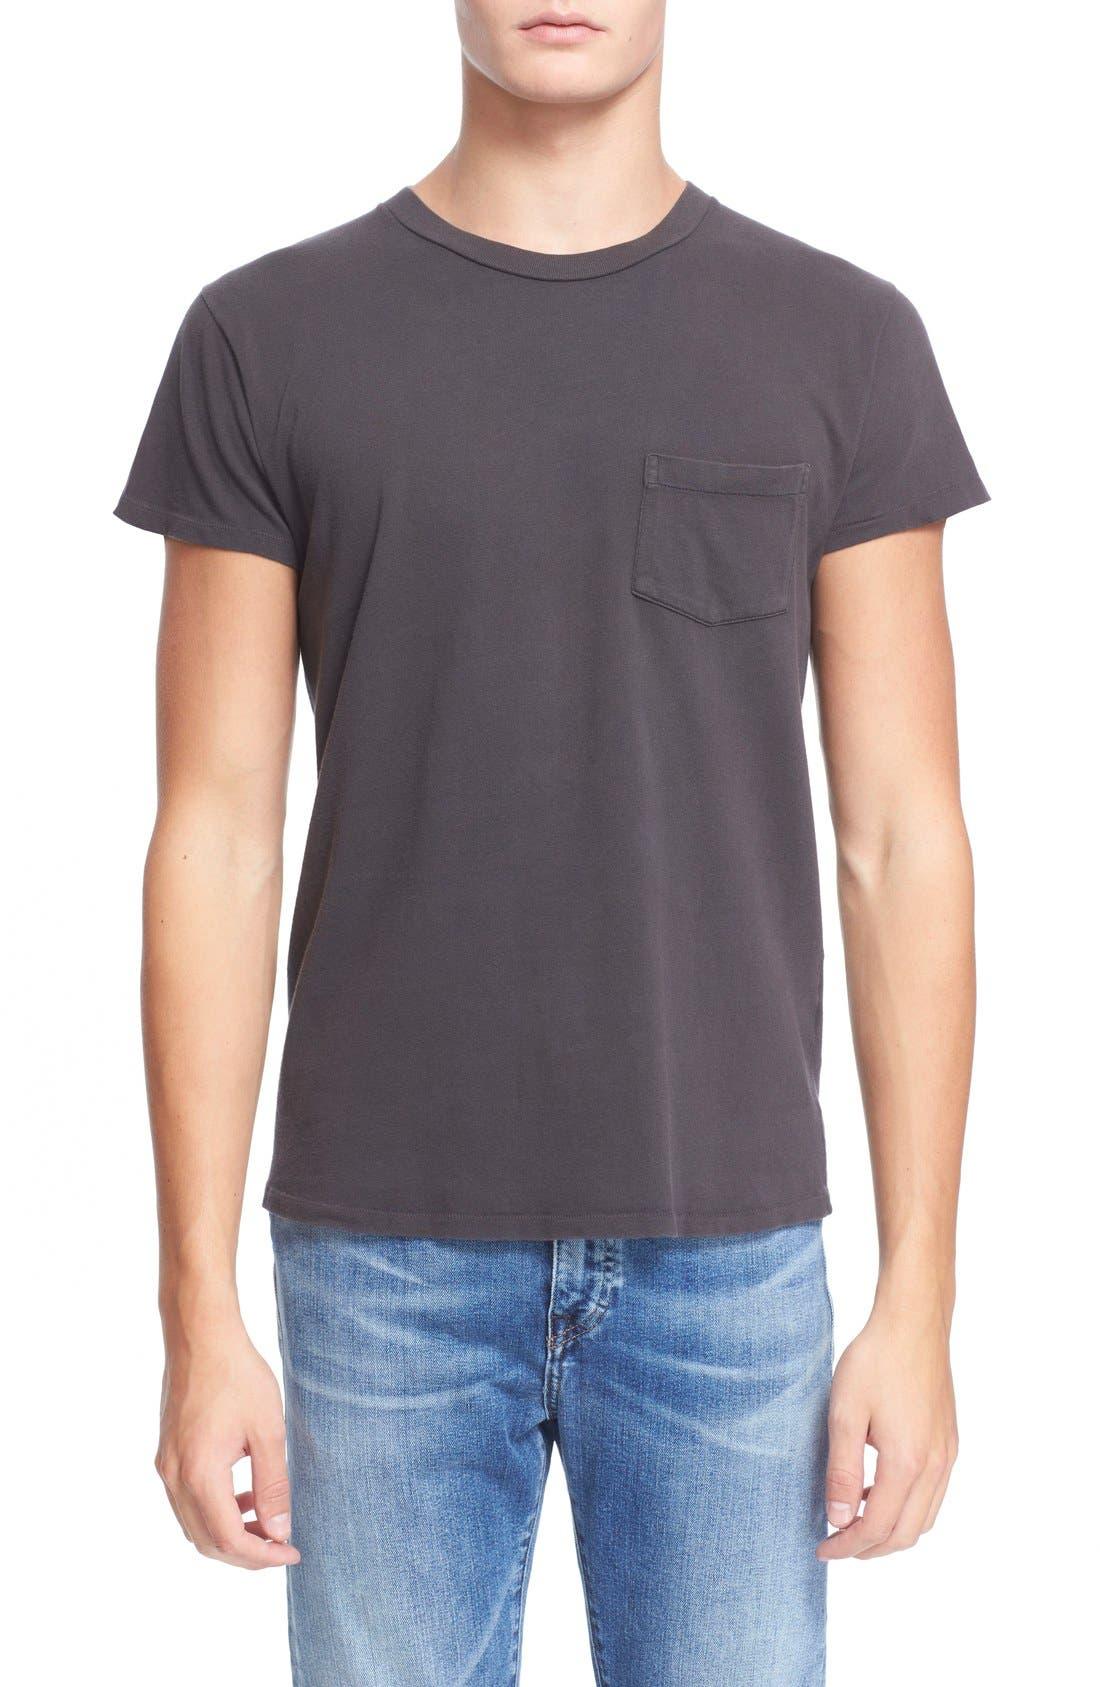 Levi's Vintage Clothing '1950s' Pocket T-Shirt